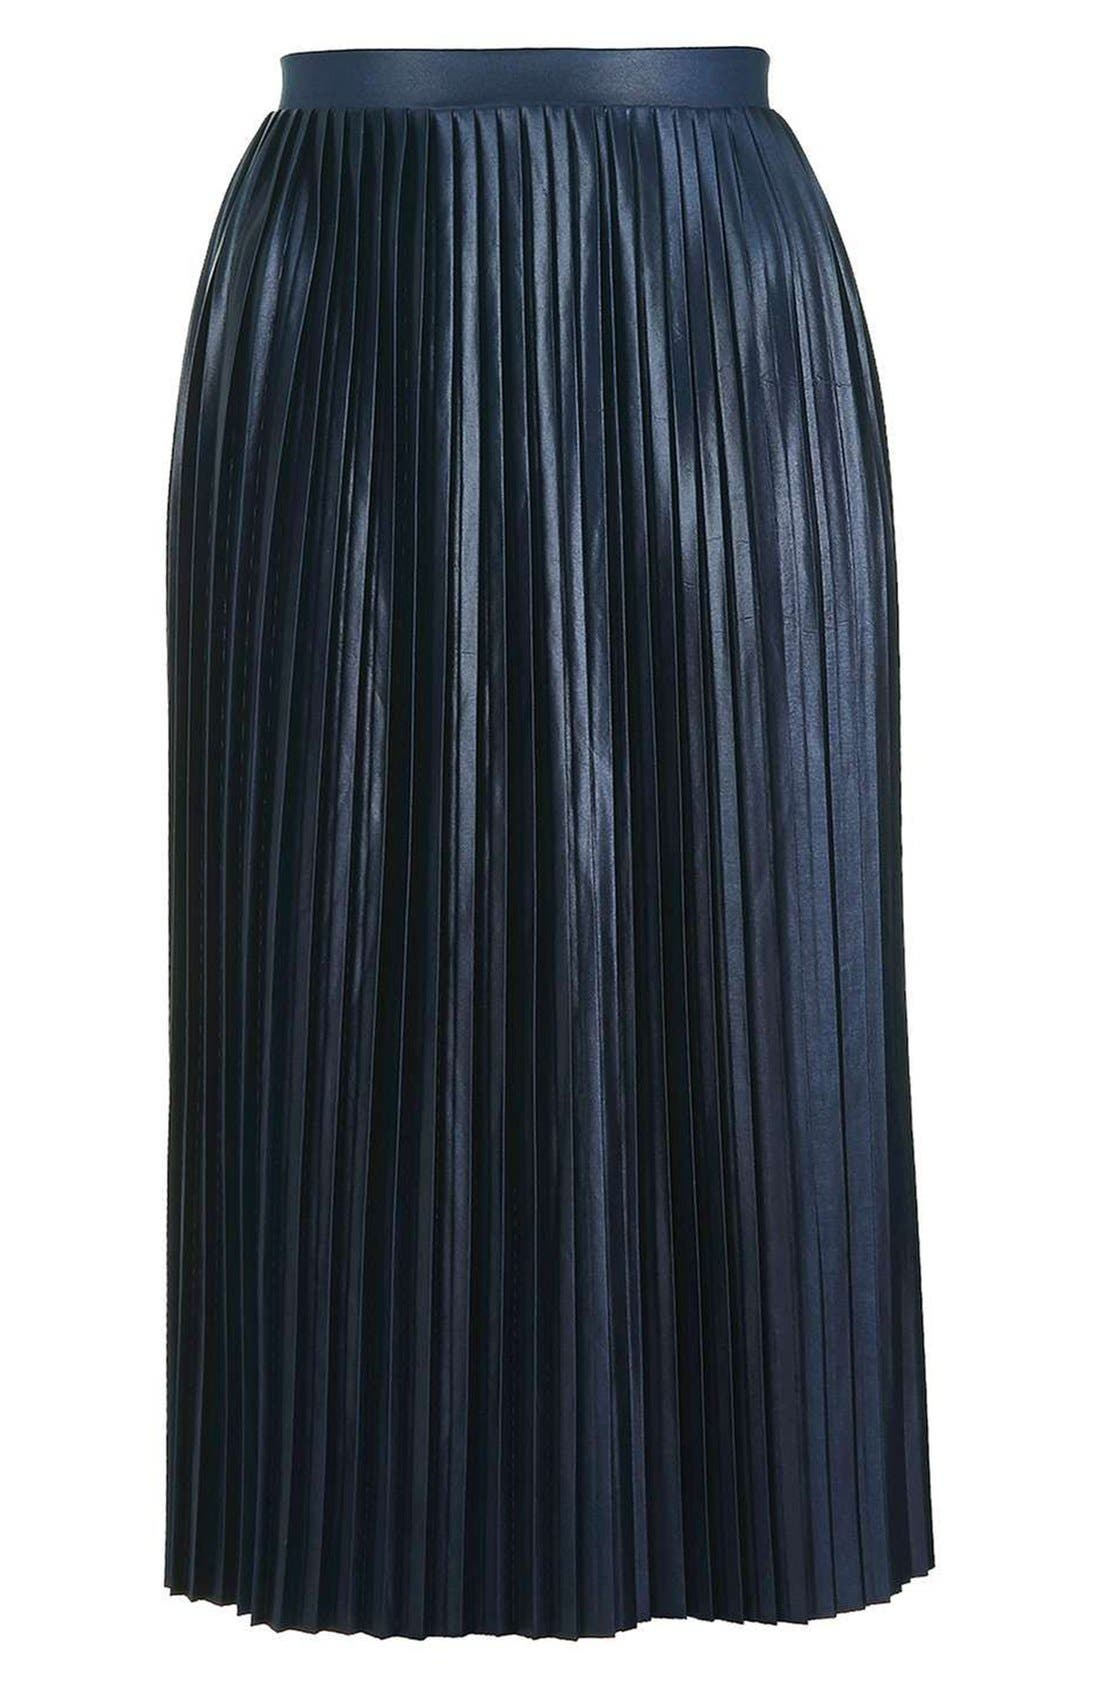 TOPSHOP,                             Pleat Jersey Midi Skirt,                             Alternate thumbnail 4, color,                             410